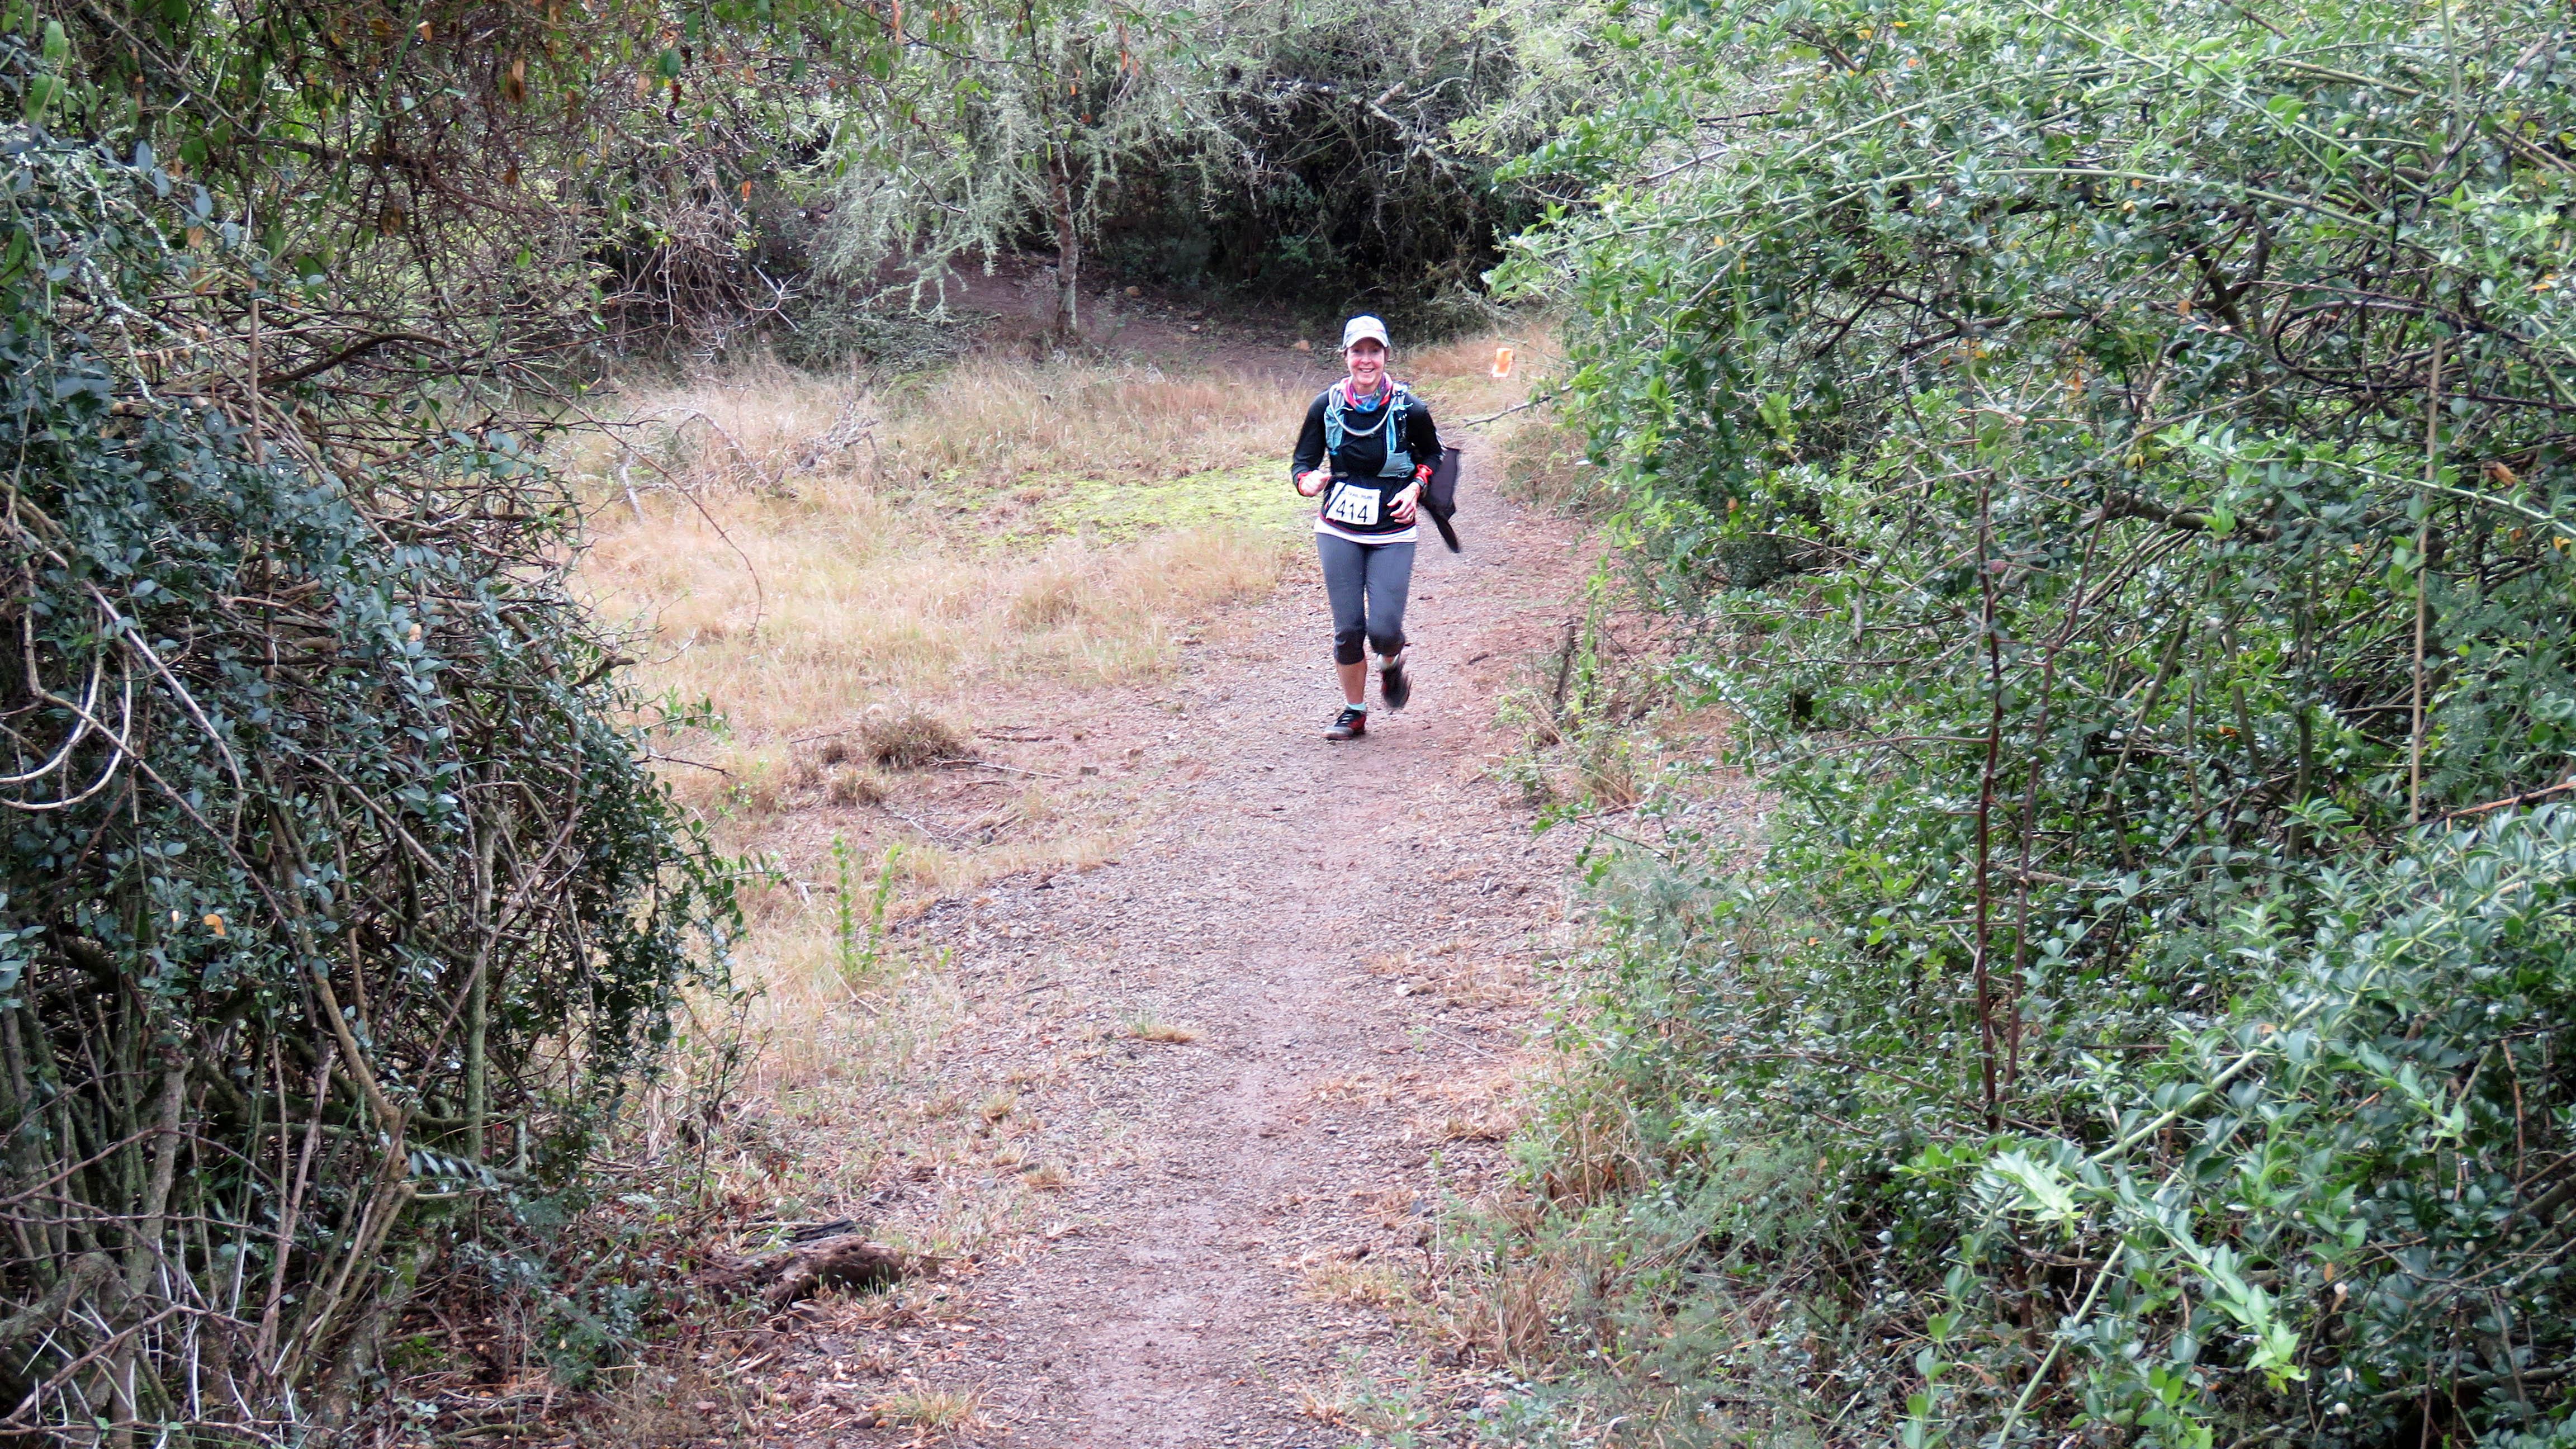 hayterdale trailrun 2018-08-05  (71)